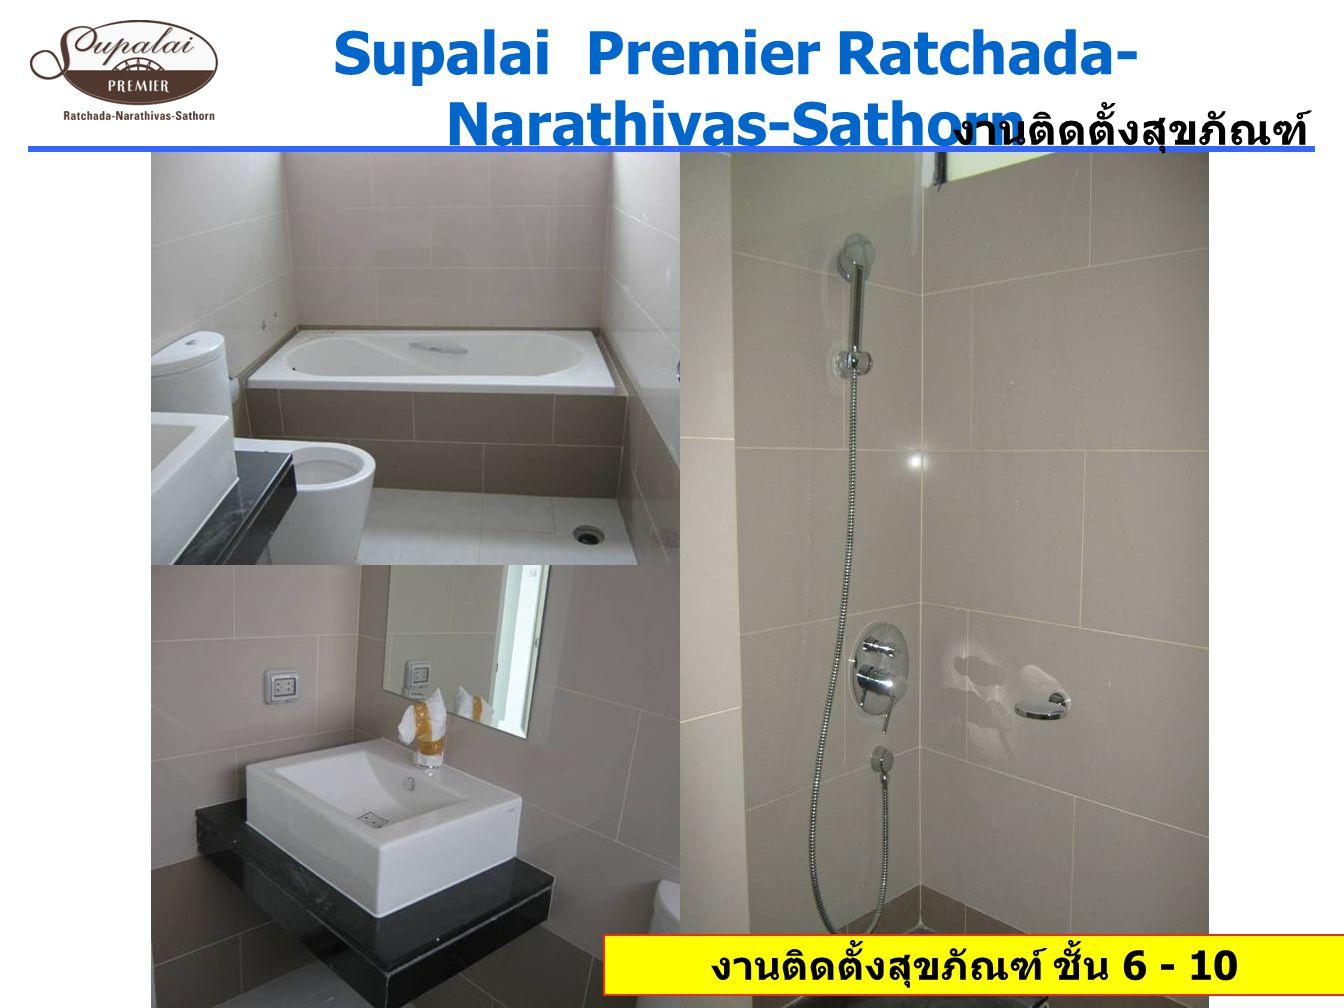 Supalai Premier Ratchada- Narathivas-Sathorn งานติดตั้งสุขภัณฑ์ งานติดตั้งสุขภัณฑ์ ชั้น 6 - 10